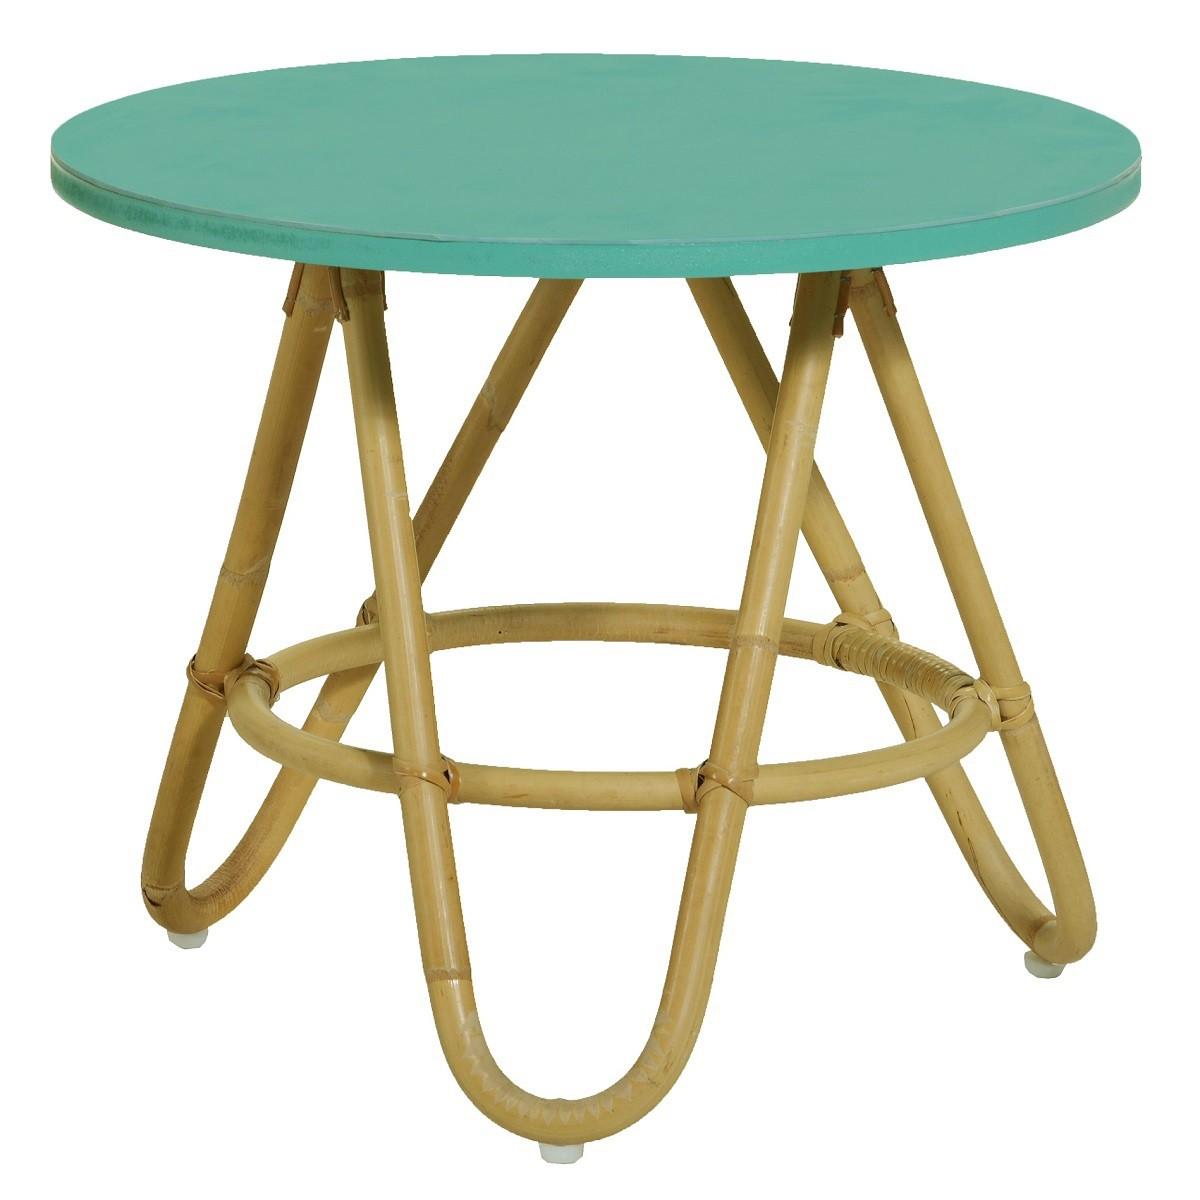 Diabolo rattan coffee table with Aqua top